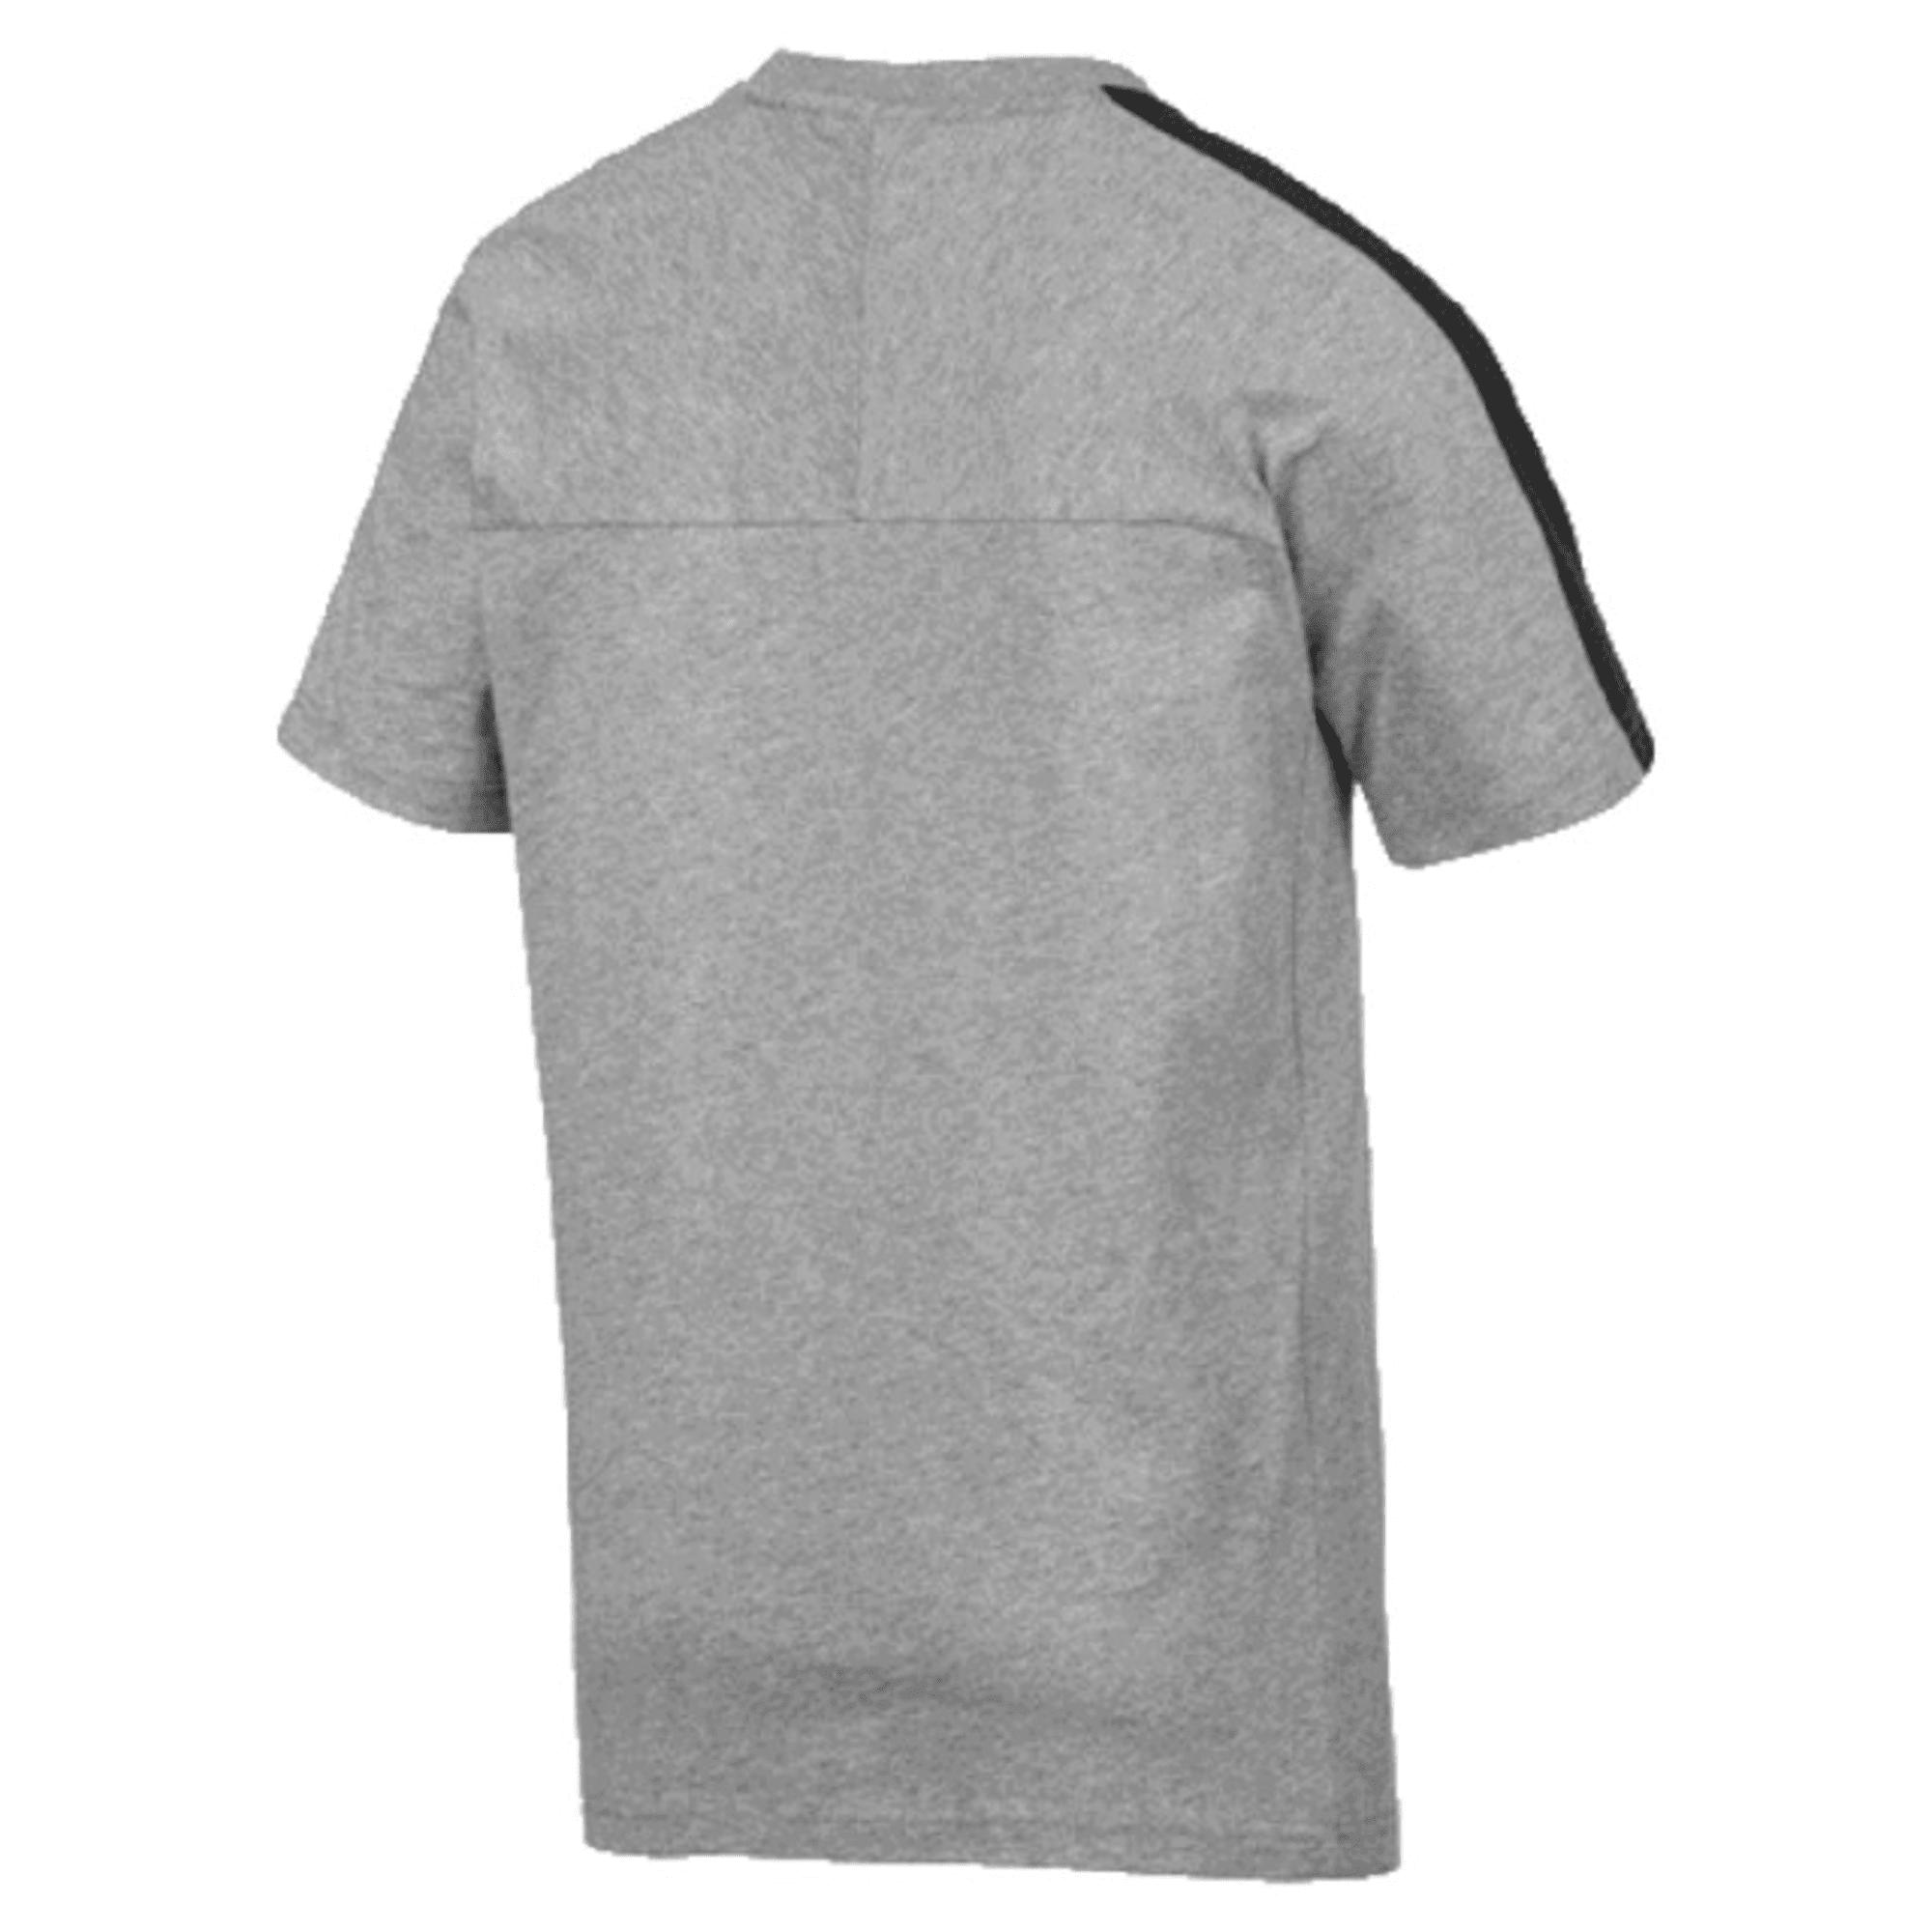 Thumbnail 5 of T-shirt Scuderia Ferrari T7 uomo, Medium Gray Heather, medium